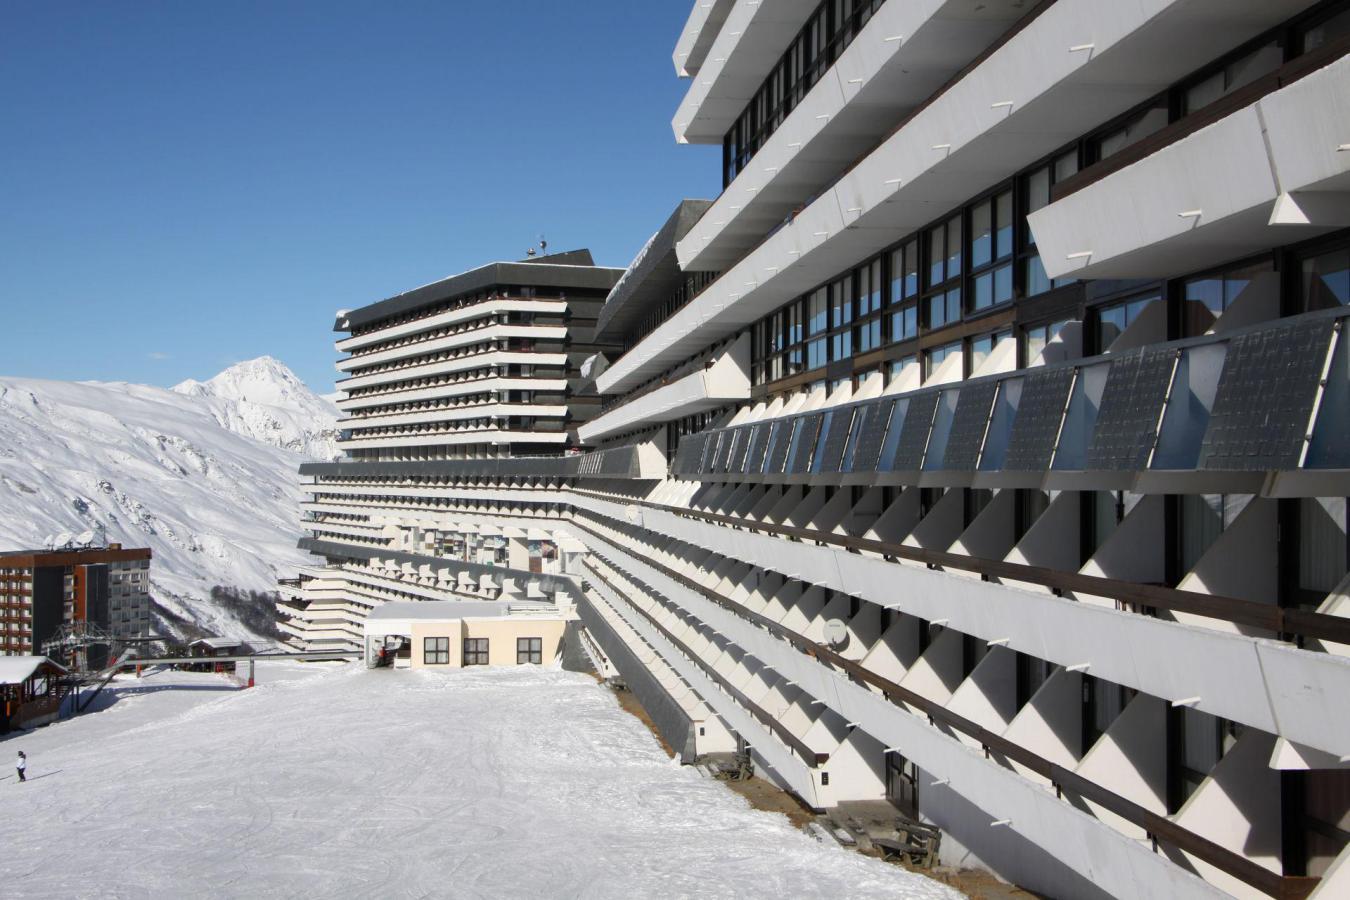 Location au ski Residence Les Evons - Les Menuires